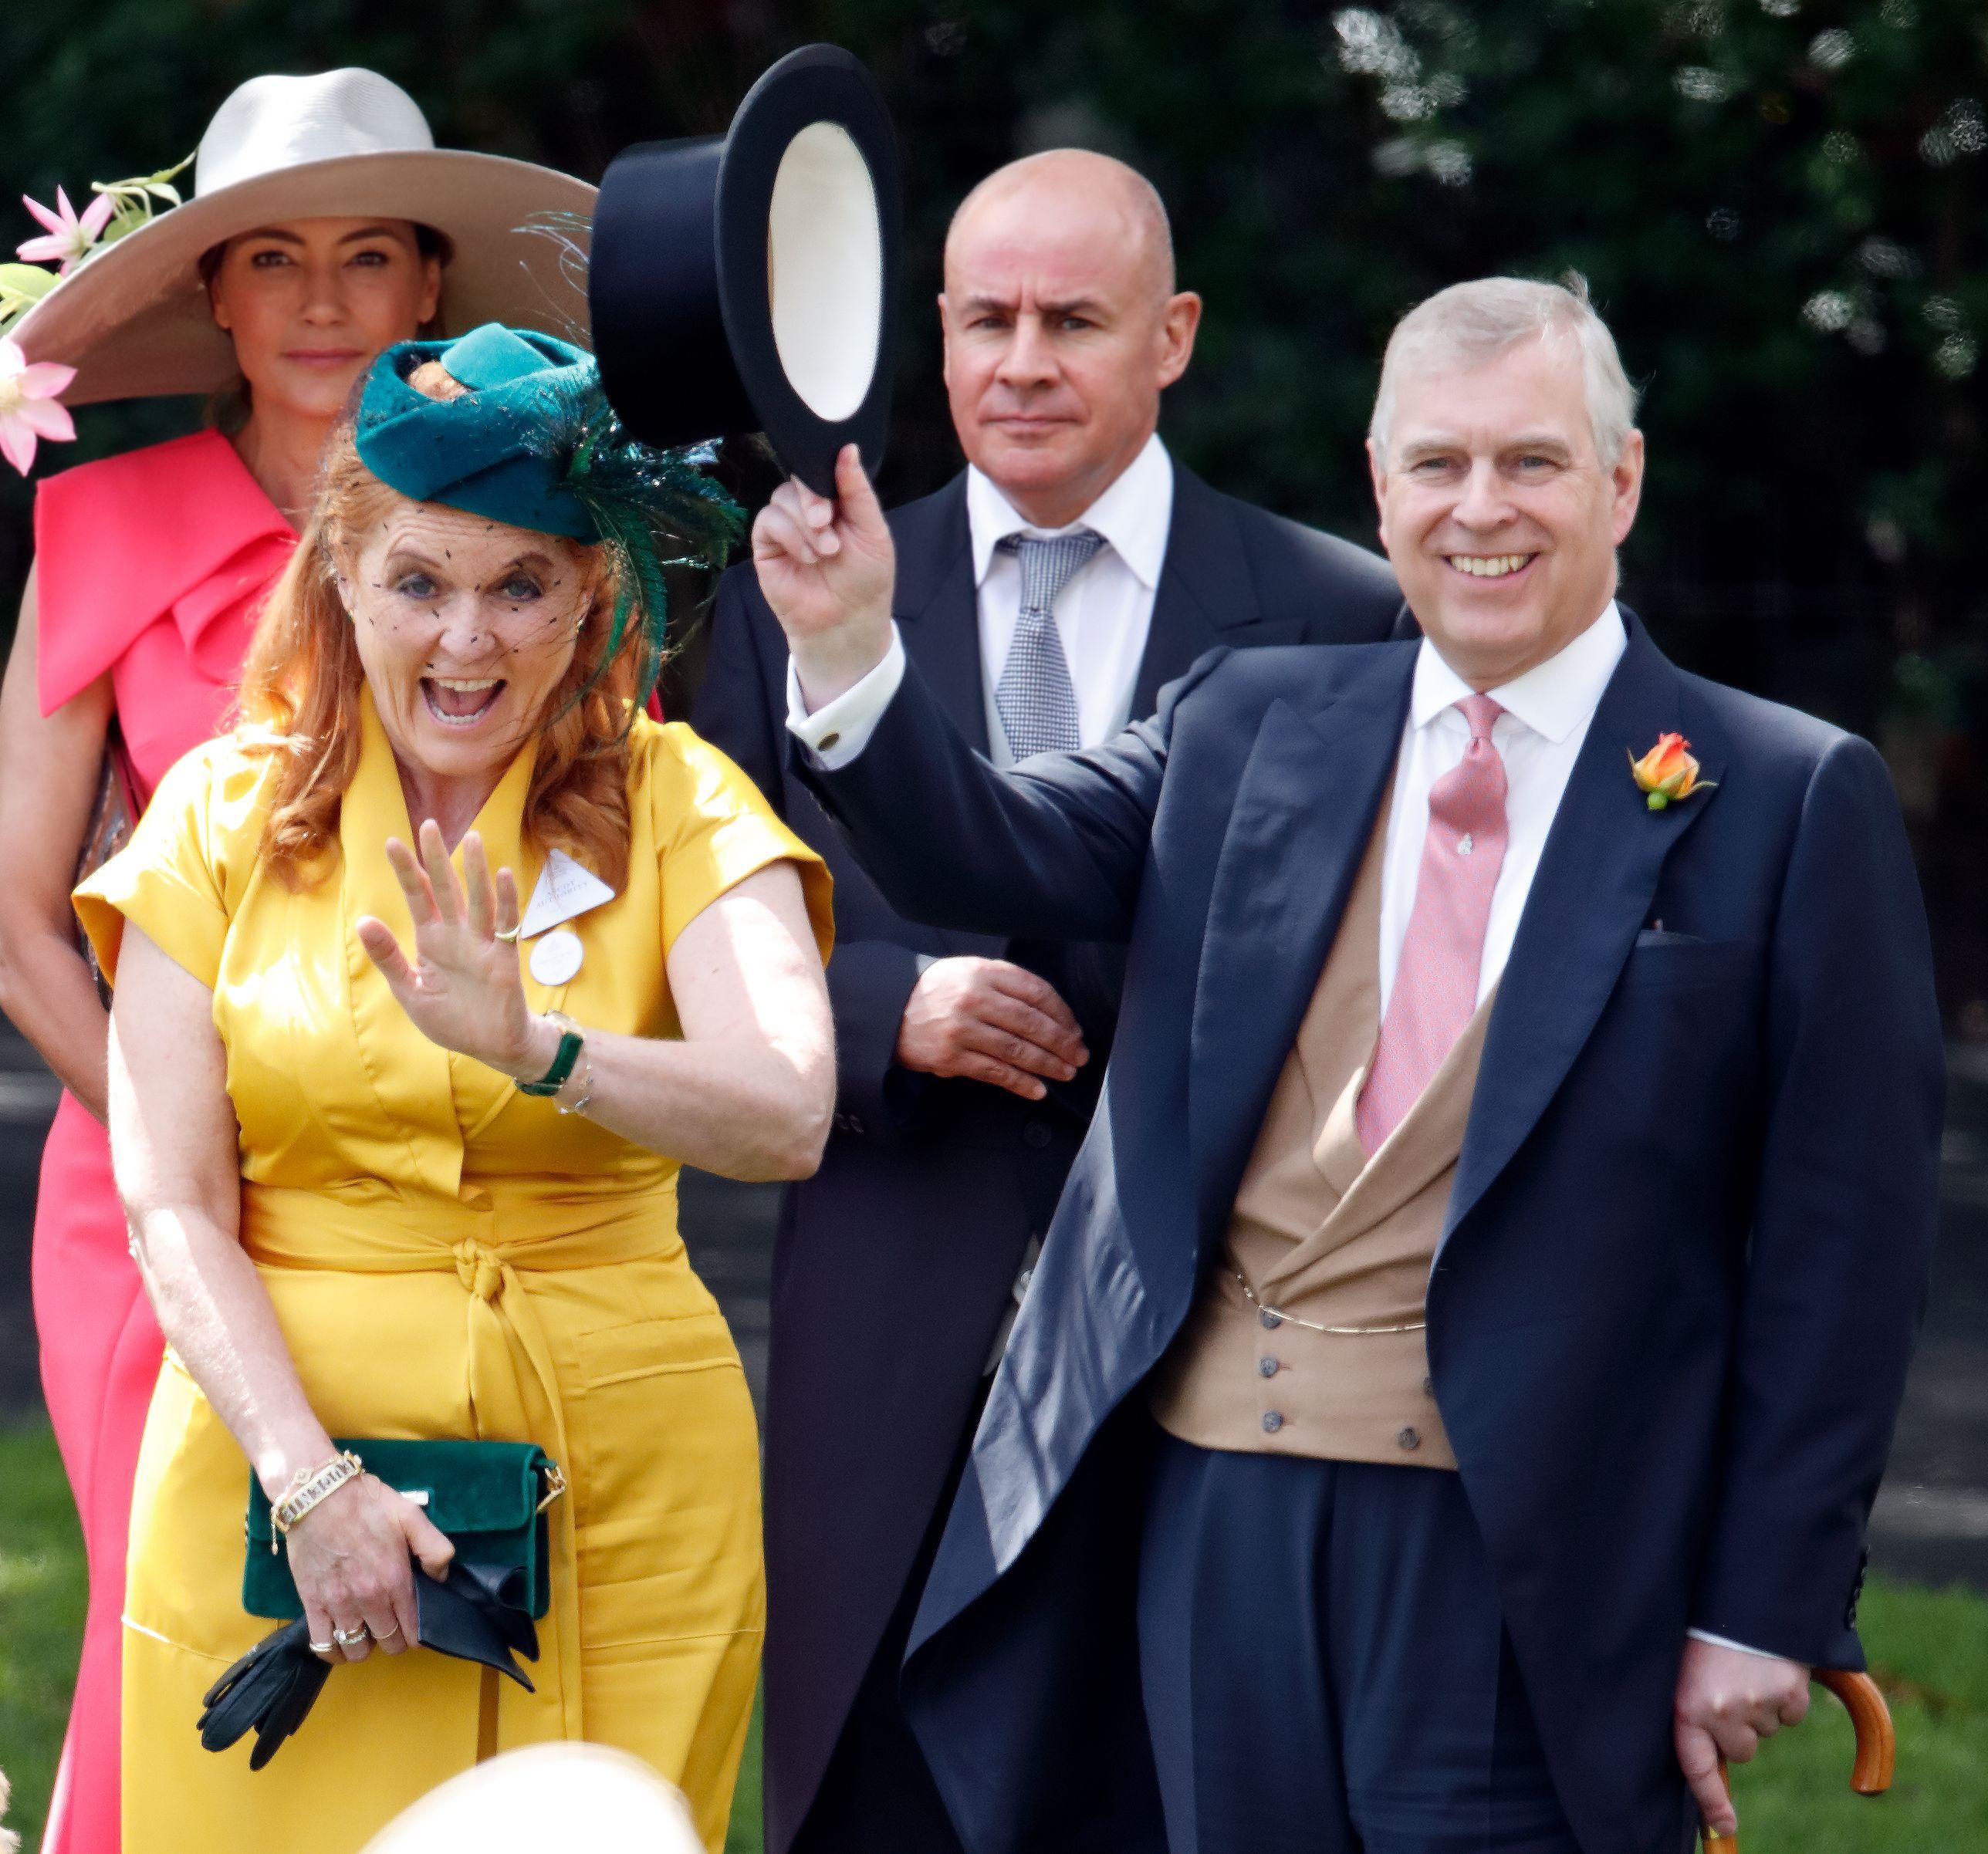 Prince Andrew Sarah Ferguson S Comments About Princess